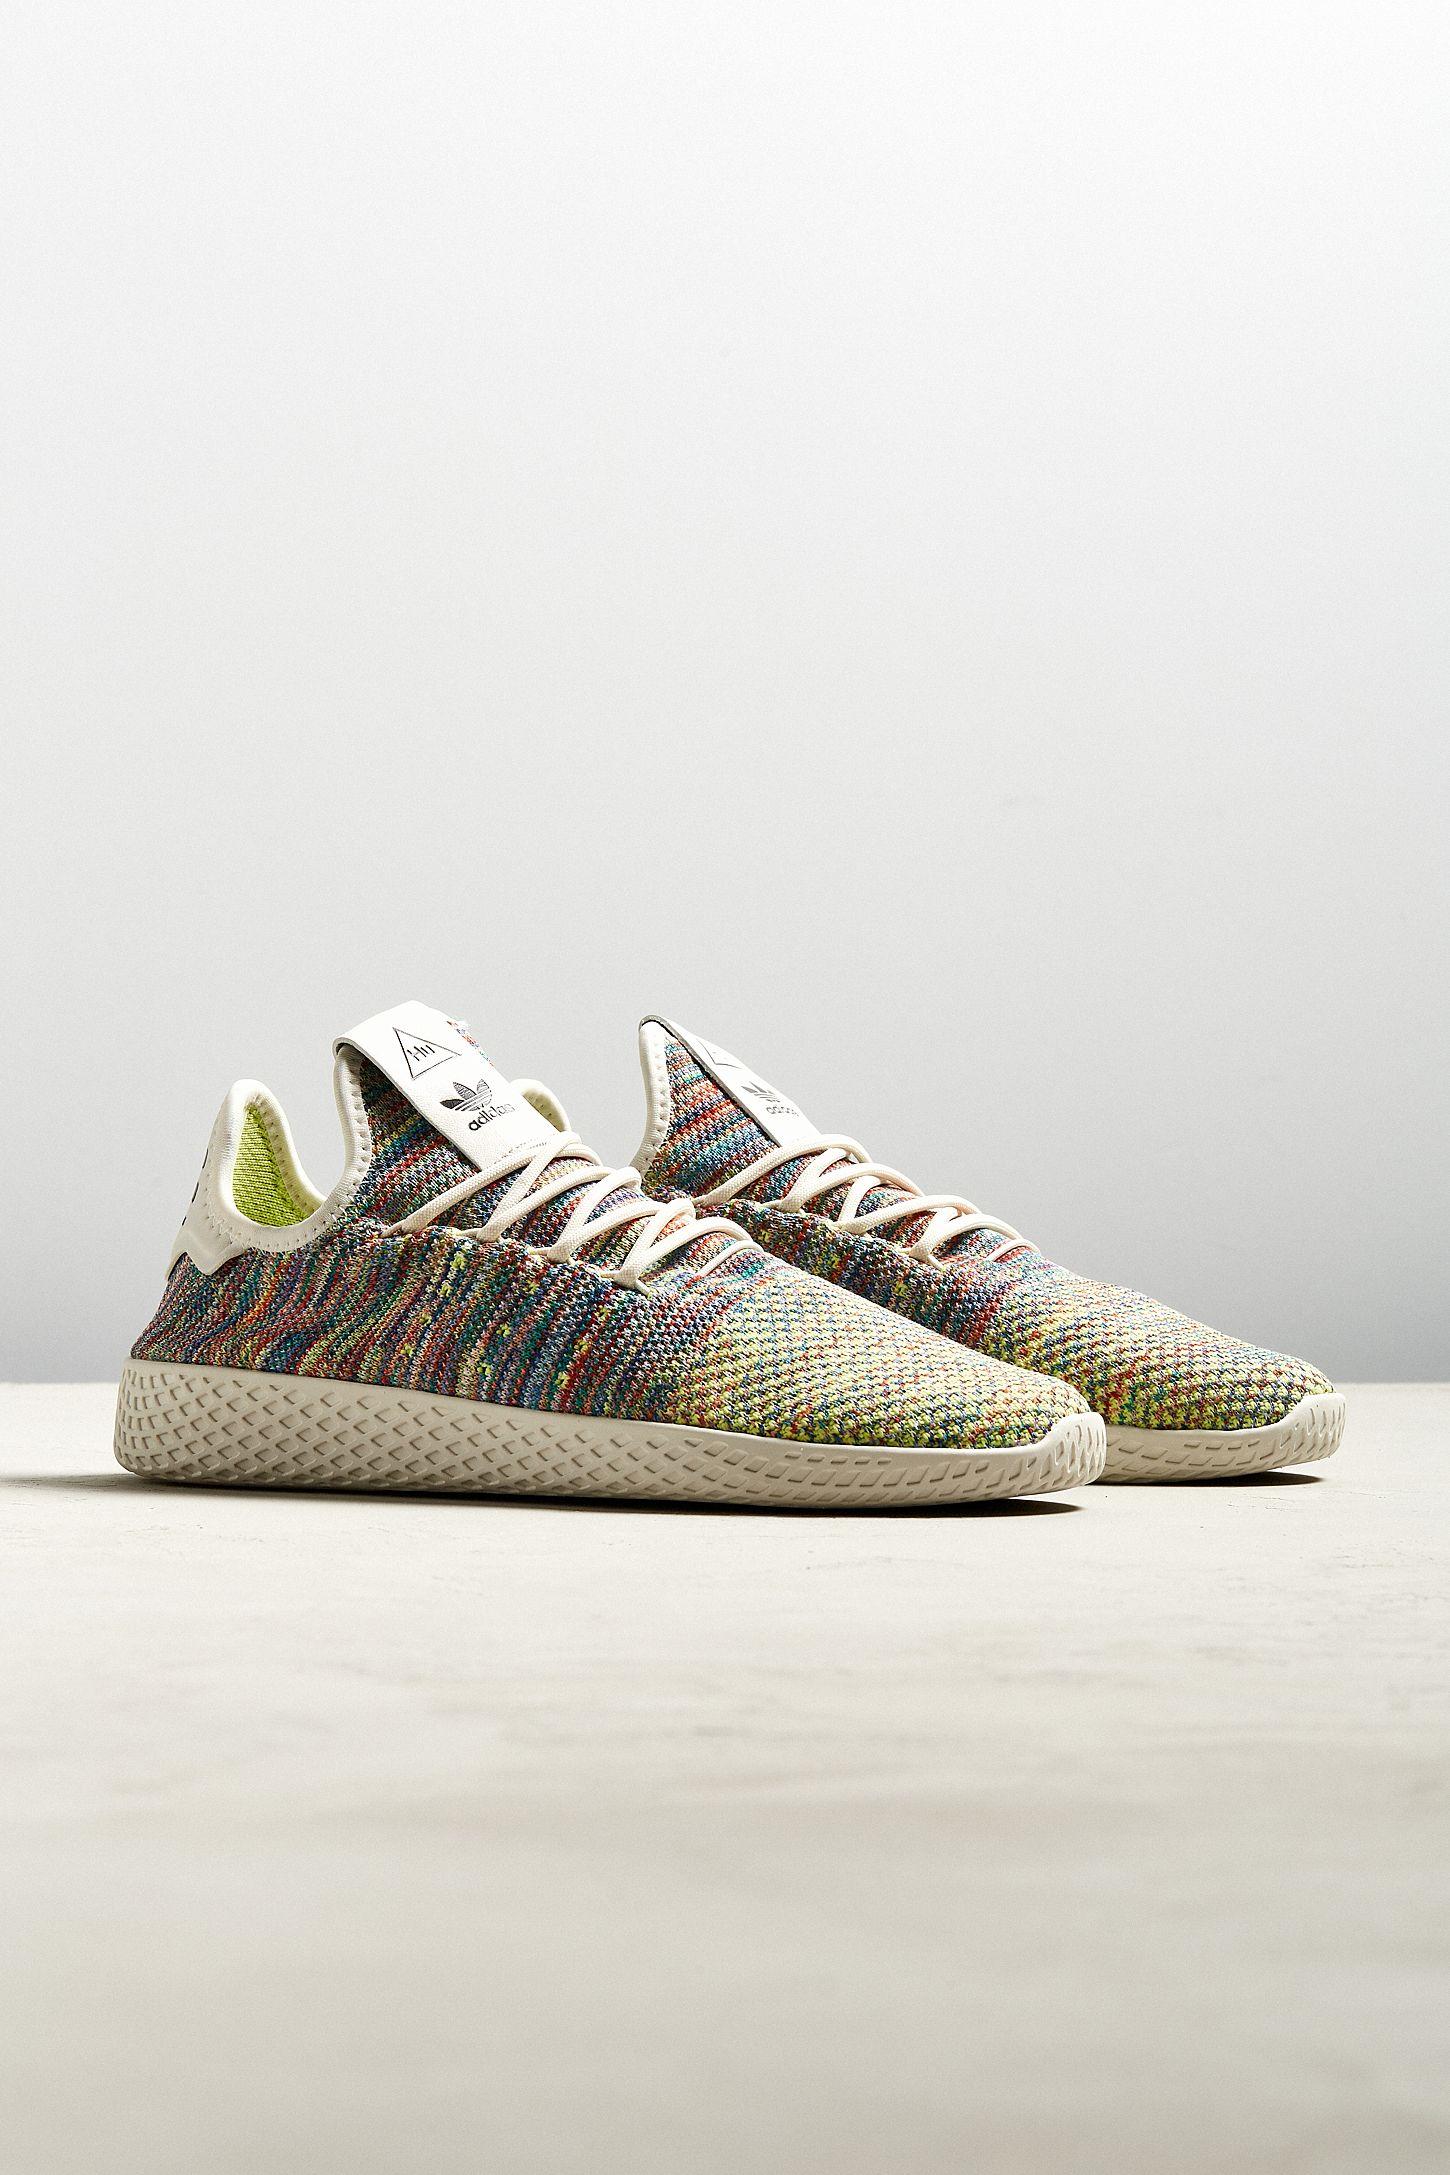 572680aaa adidas Pharrell Williams Tennis HU Primeknit Sneaker